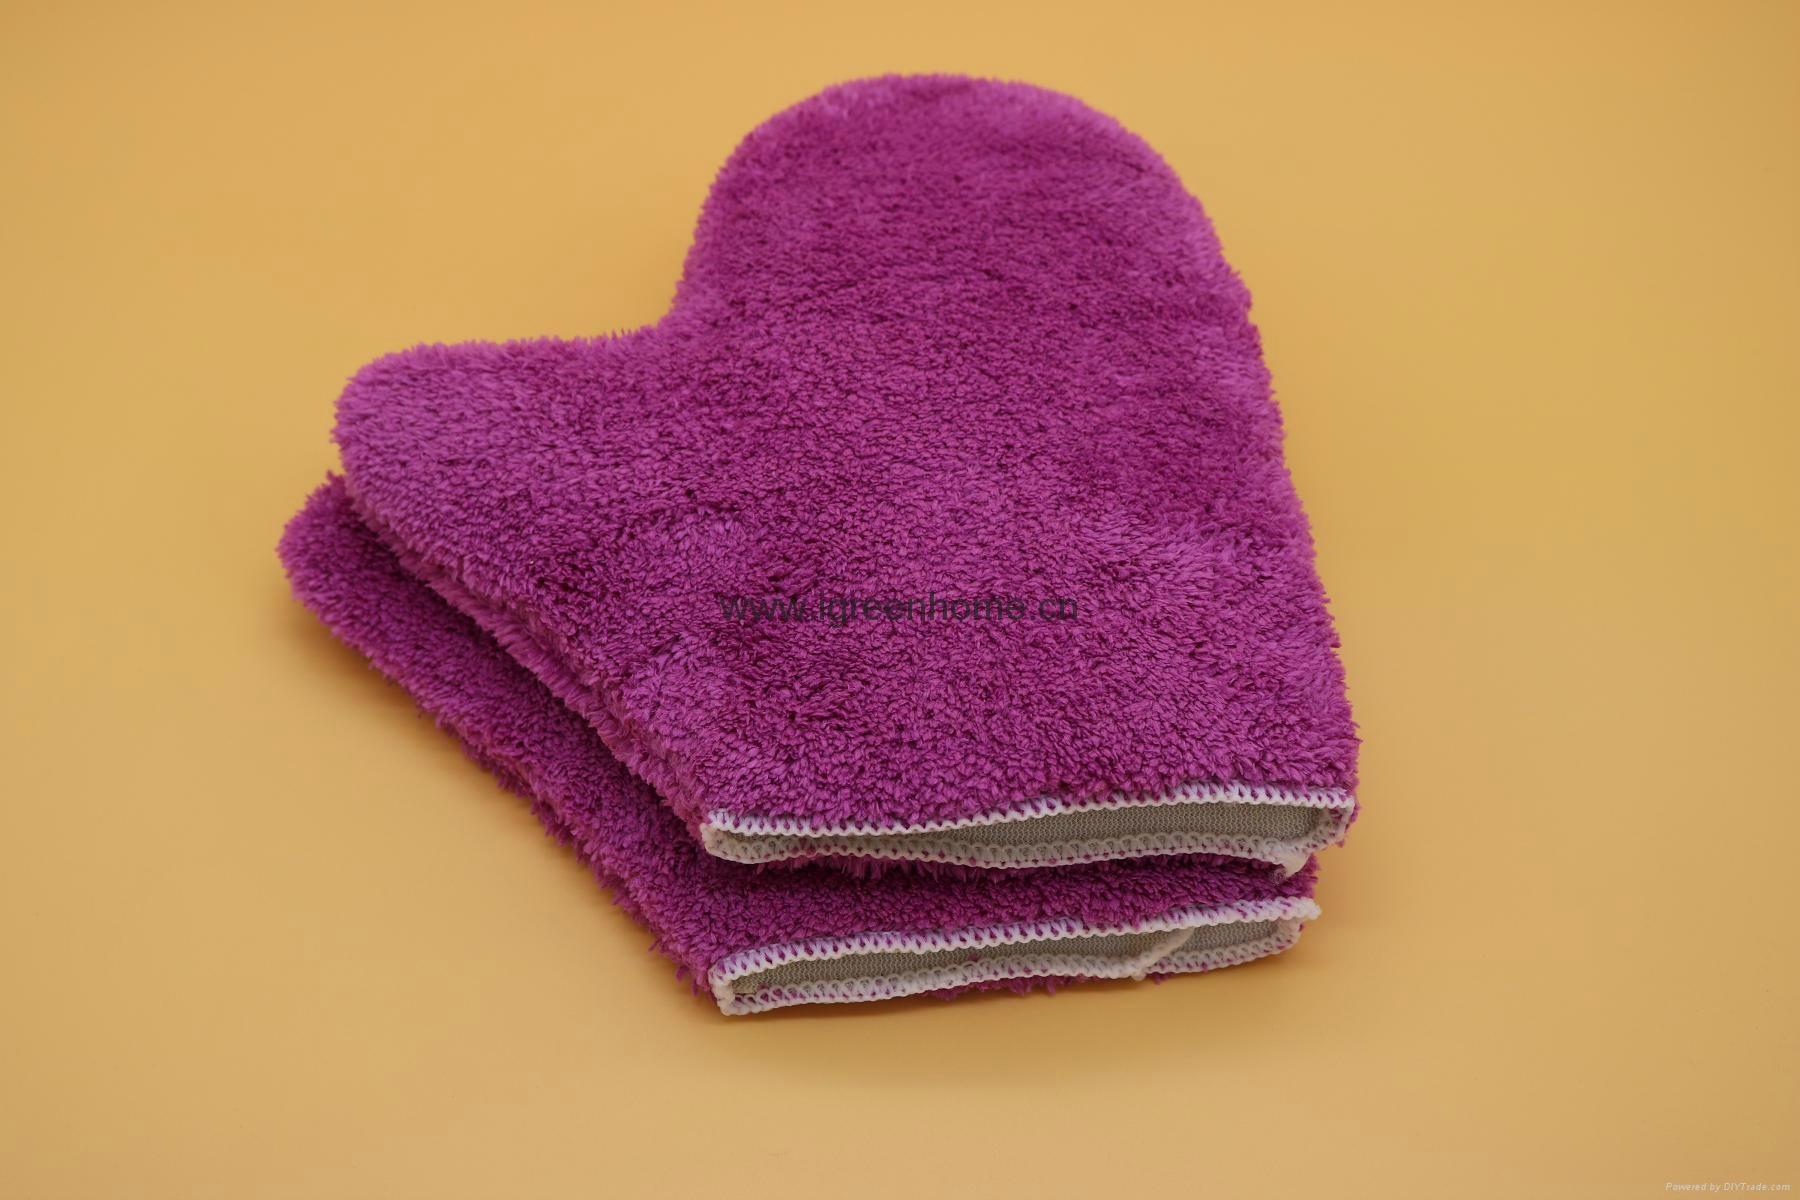 microfiber cleaning glove 5